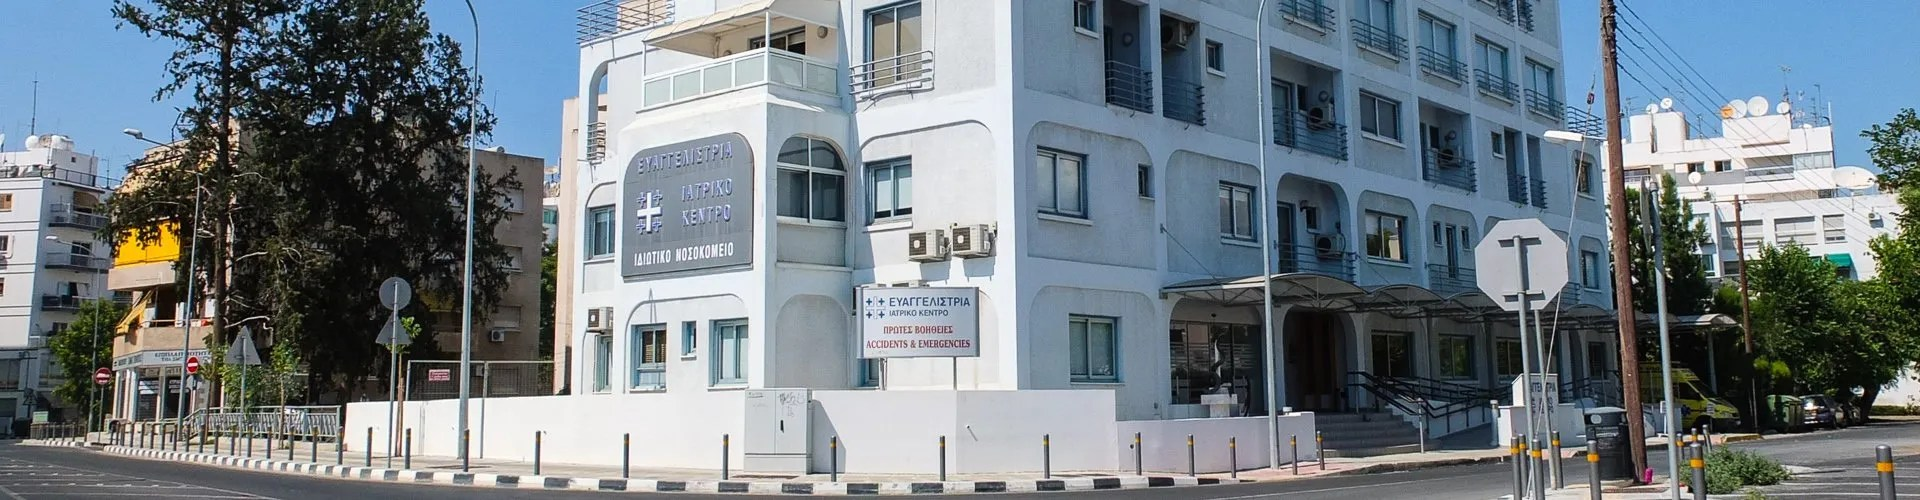 Evangelistria medical centre nicosia betting sb betting software szczecin waly chrobrego